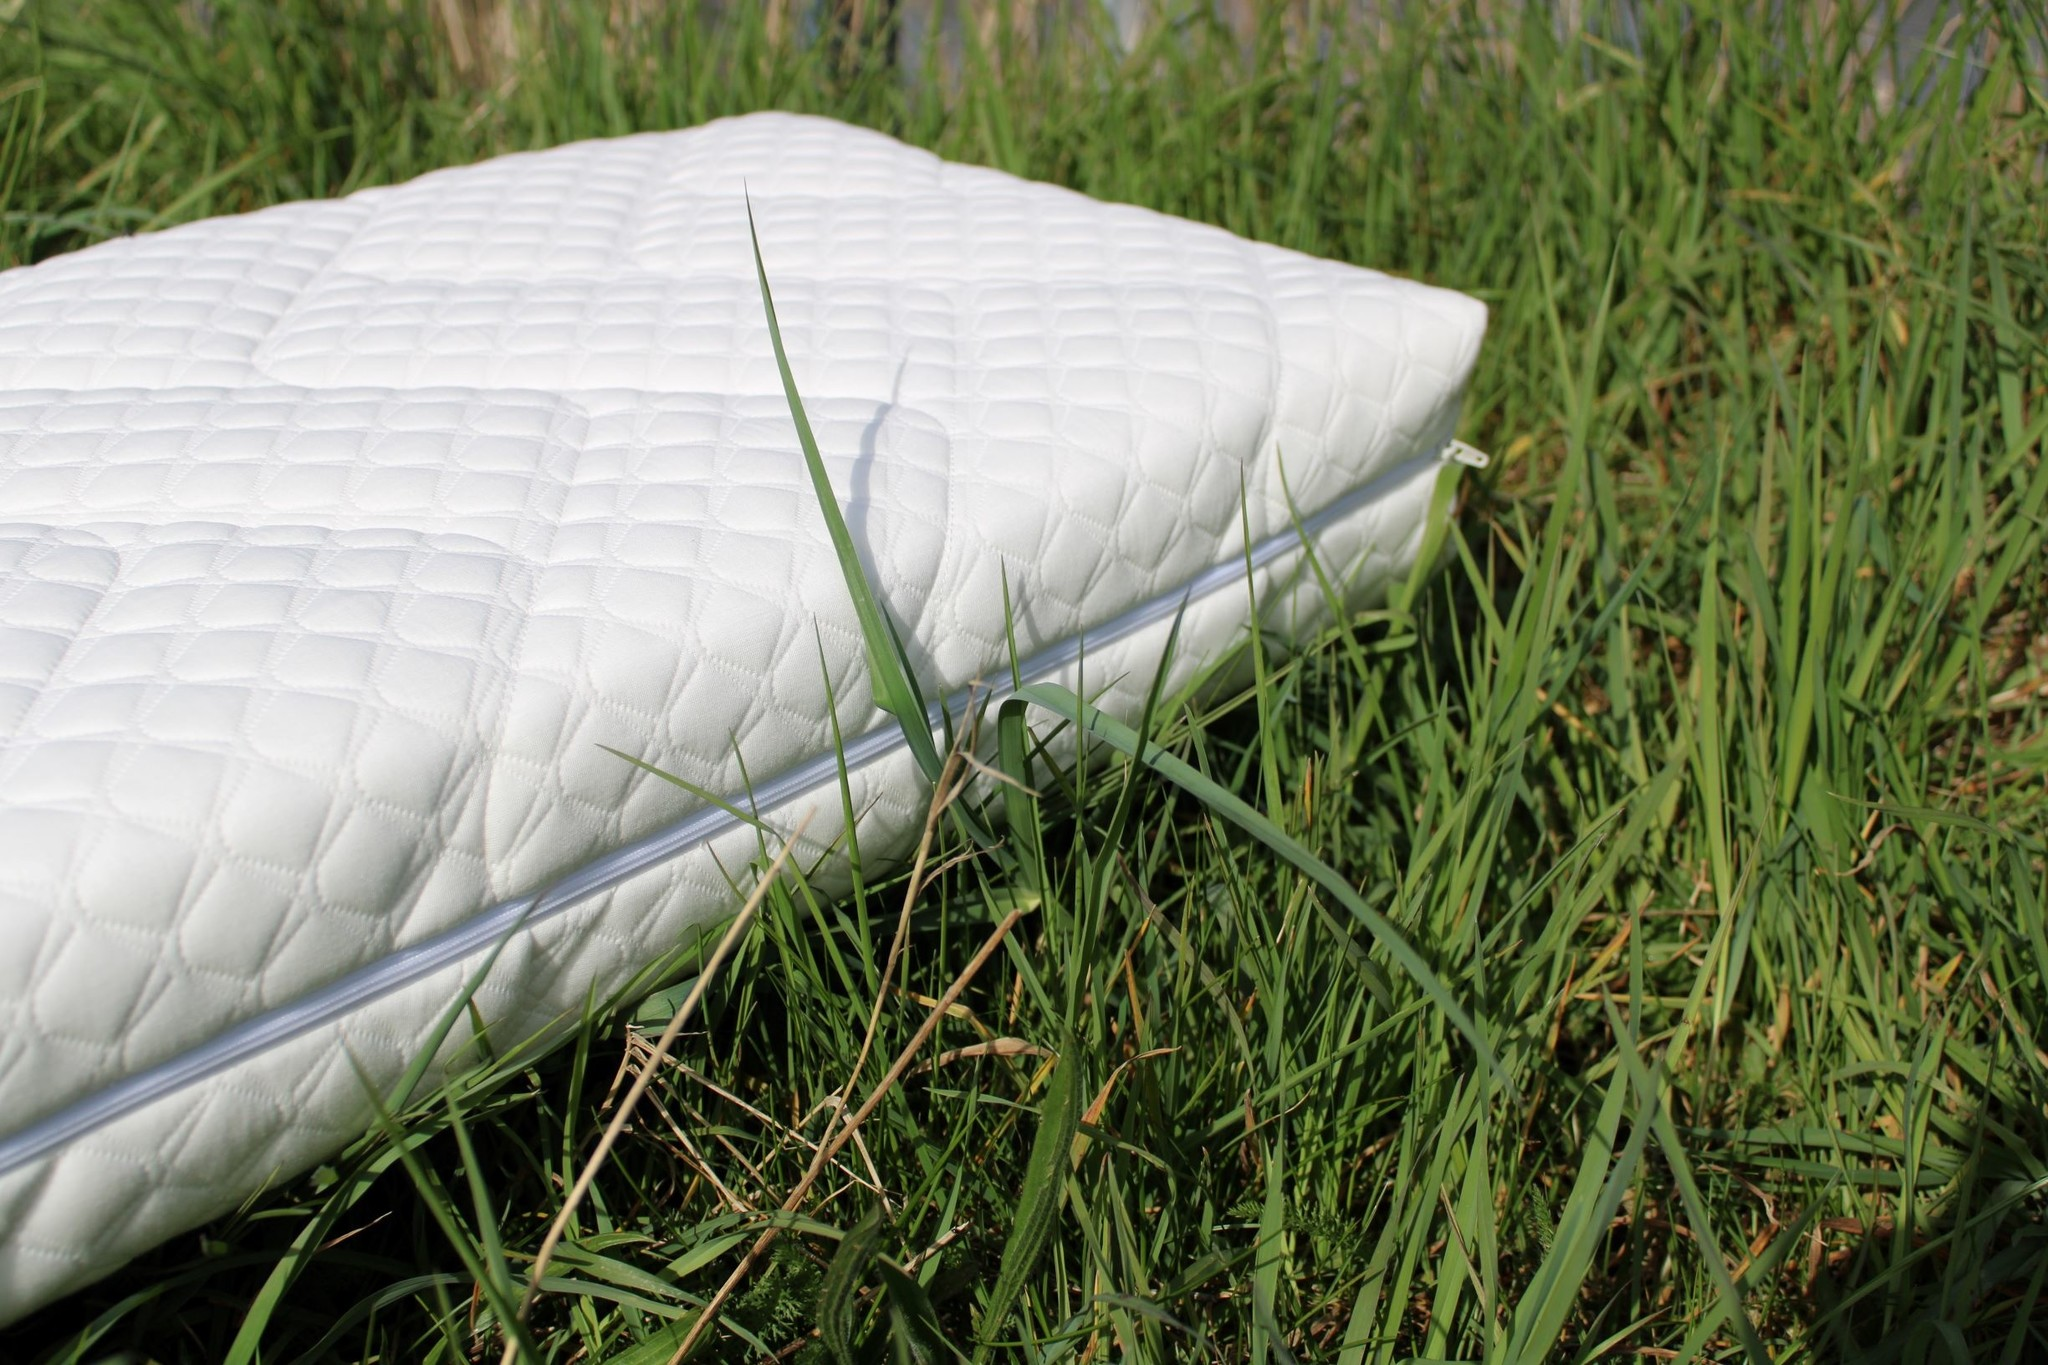 Sarpy Kindermatras 80x195 Sertel Tailor Made Mattress